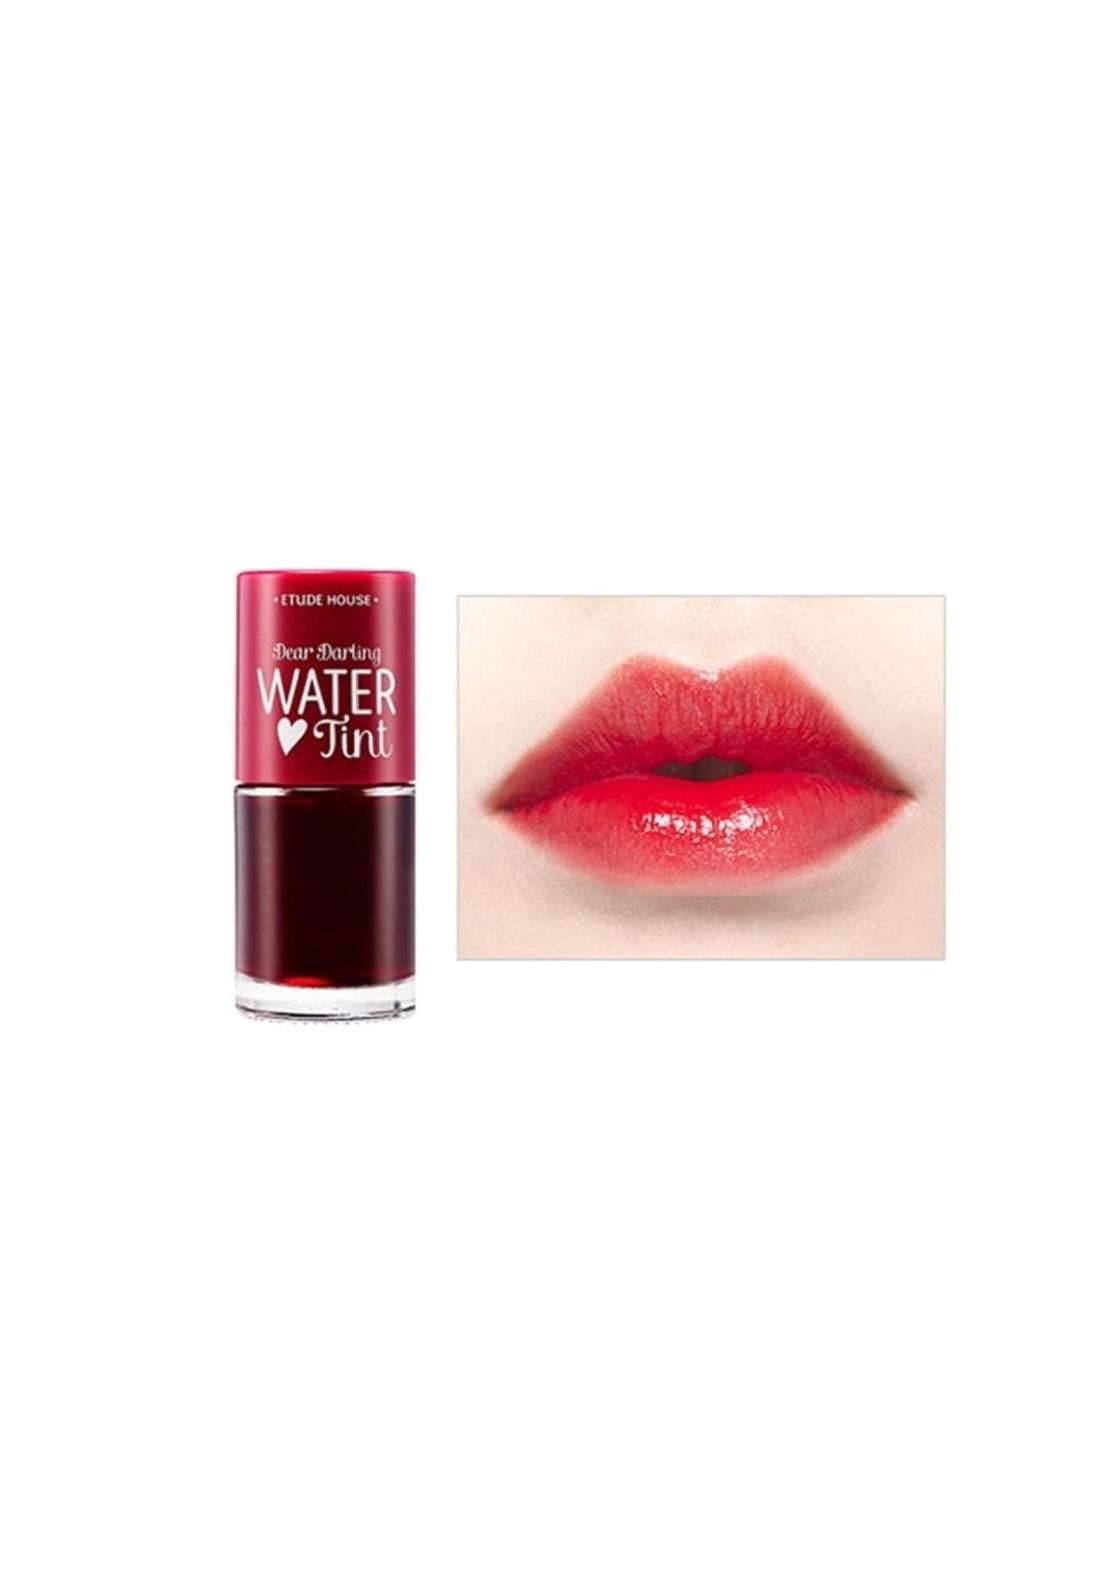 Etude house Dear Darling Water Tint تنت مورد شفاه